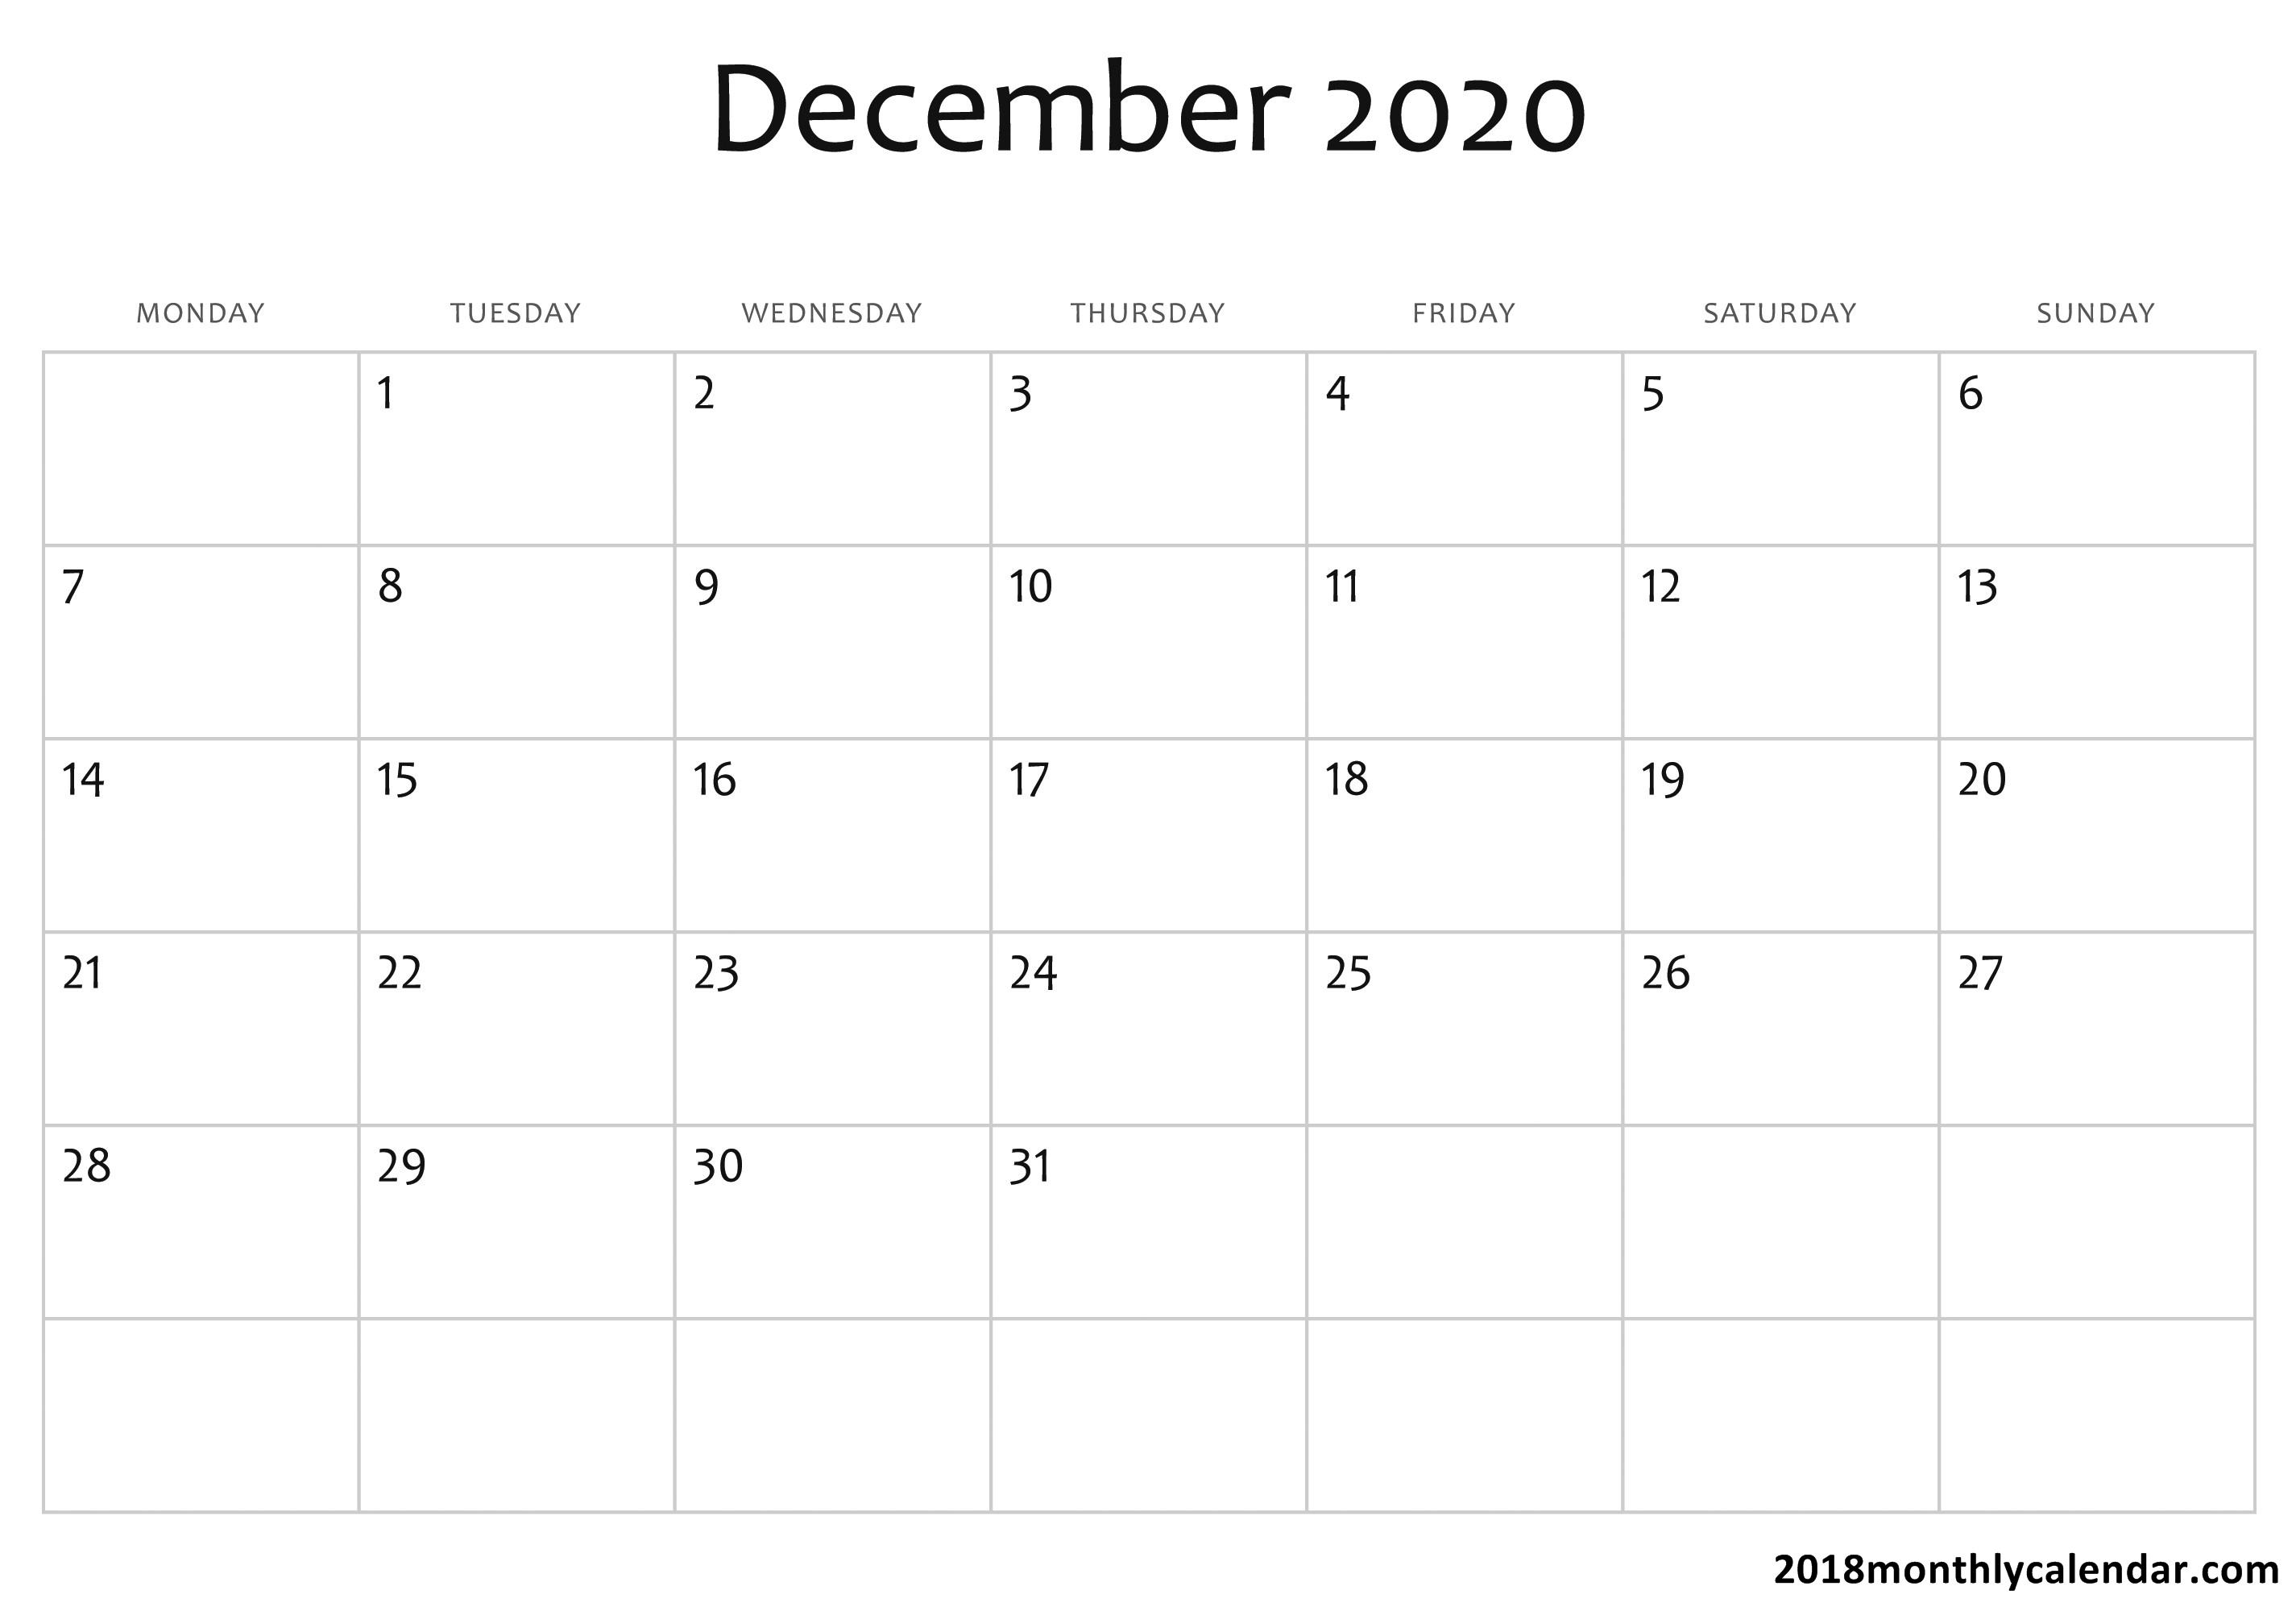 December Editable Calendar 2020 - Wpa.wpart.co